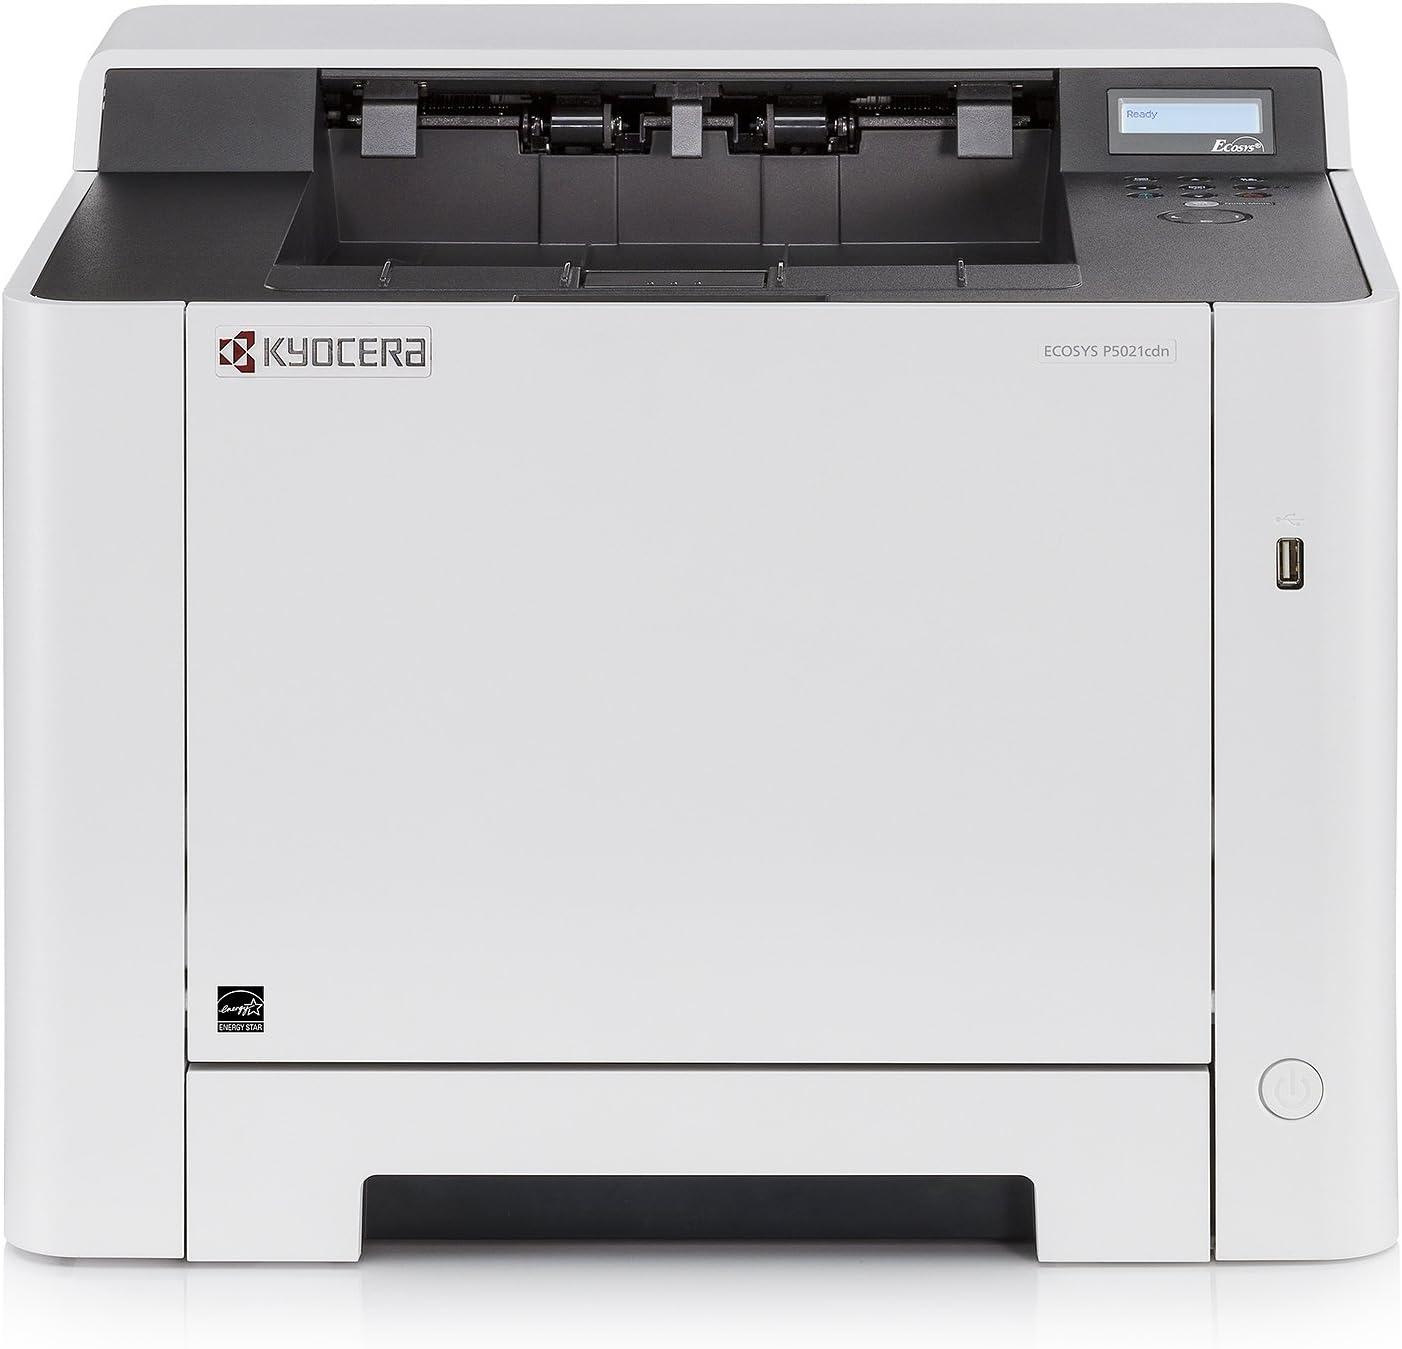 Kyocera Ecosys P5021cdn - Impresora láser a color (21 ppm, A4, doble cara, 1200 dpi, USB 2.0) - Soporte de Mobile Print para smartphone y tablet: Kyocera: Amazon.es: Informática